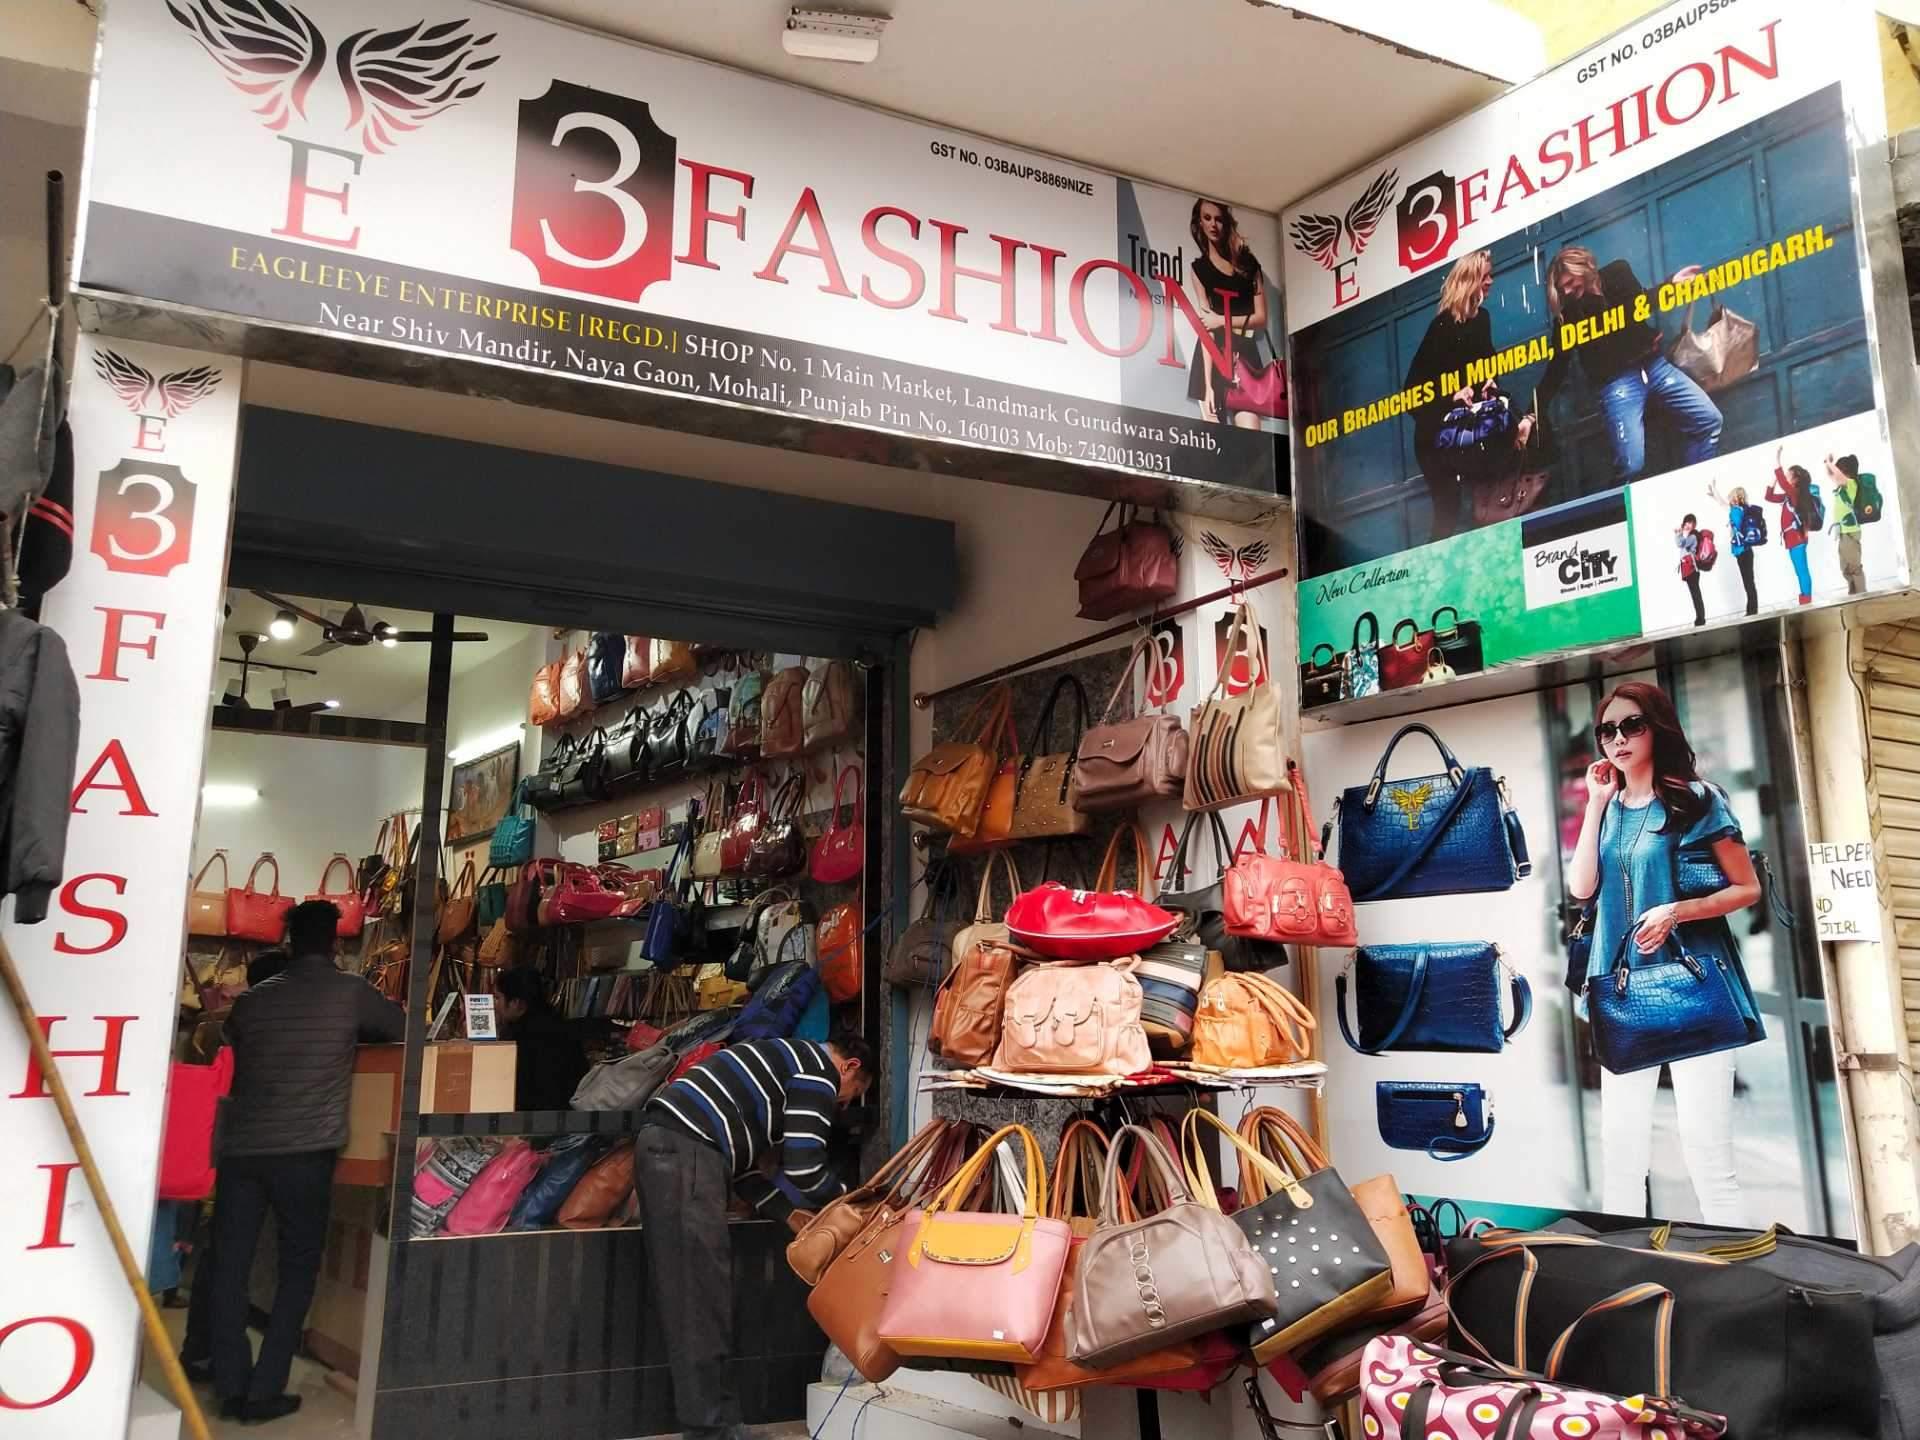 7fc4168408d7 Top 7 Jimmy Choo Bag Dealers in Chandigarh - Best Jimmy Choo Bag ...